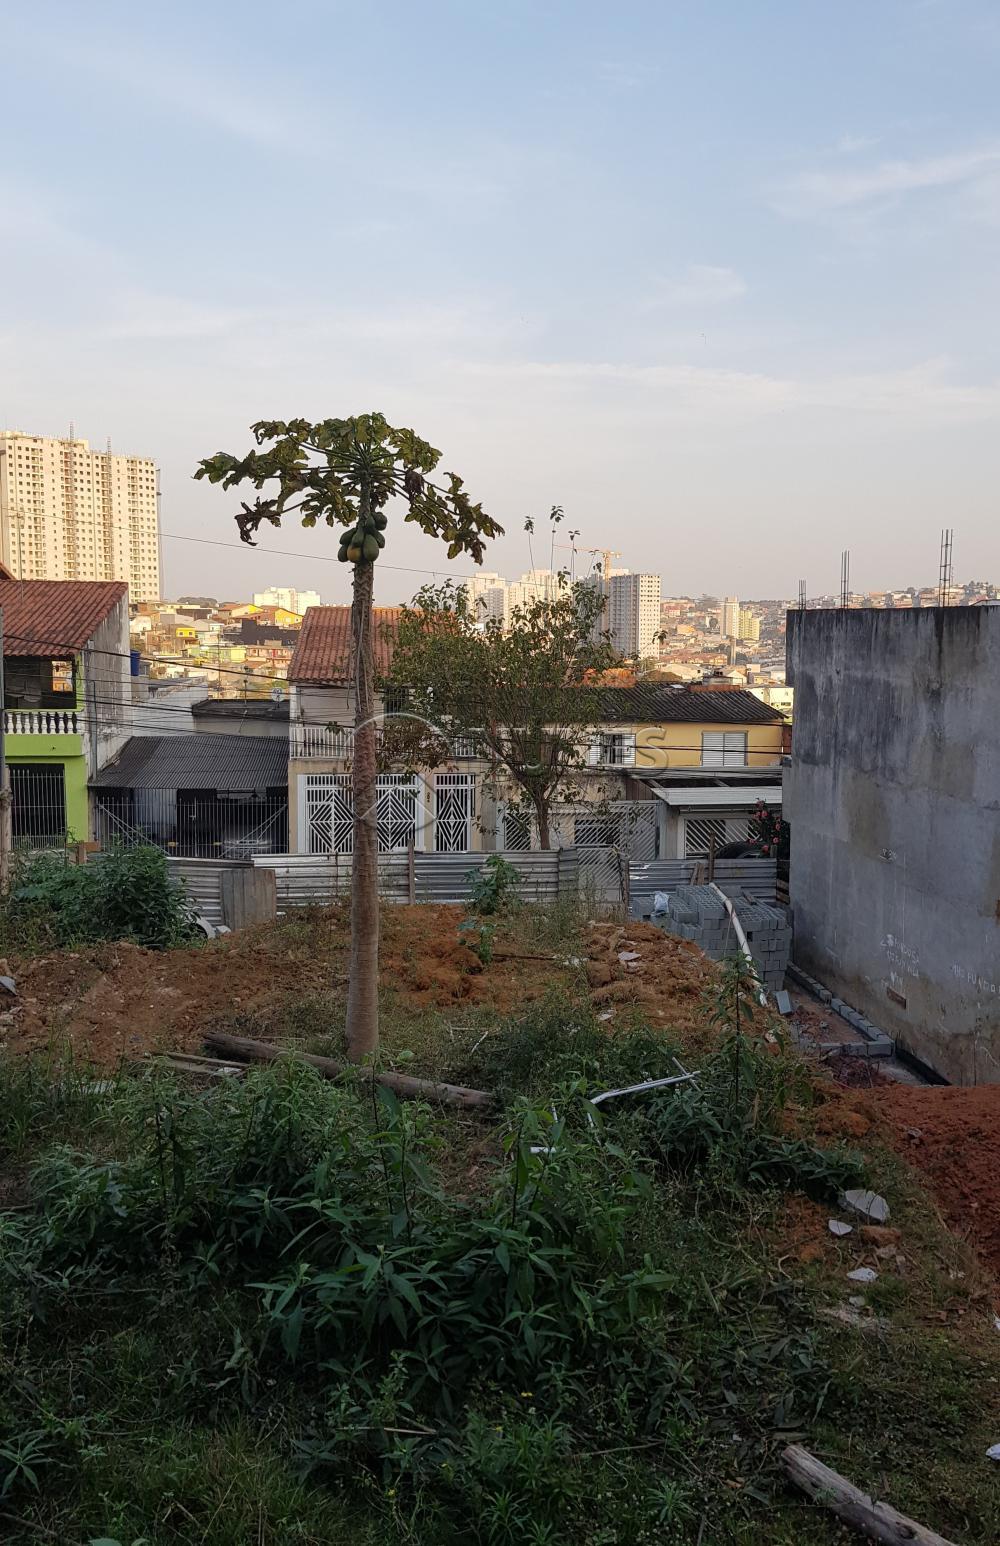 Comprar Terreno / Terreno em Osasco apenas R$ 165.000,00 - Foto 7